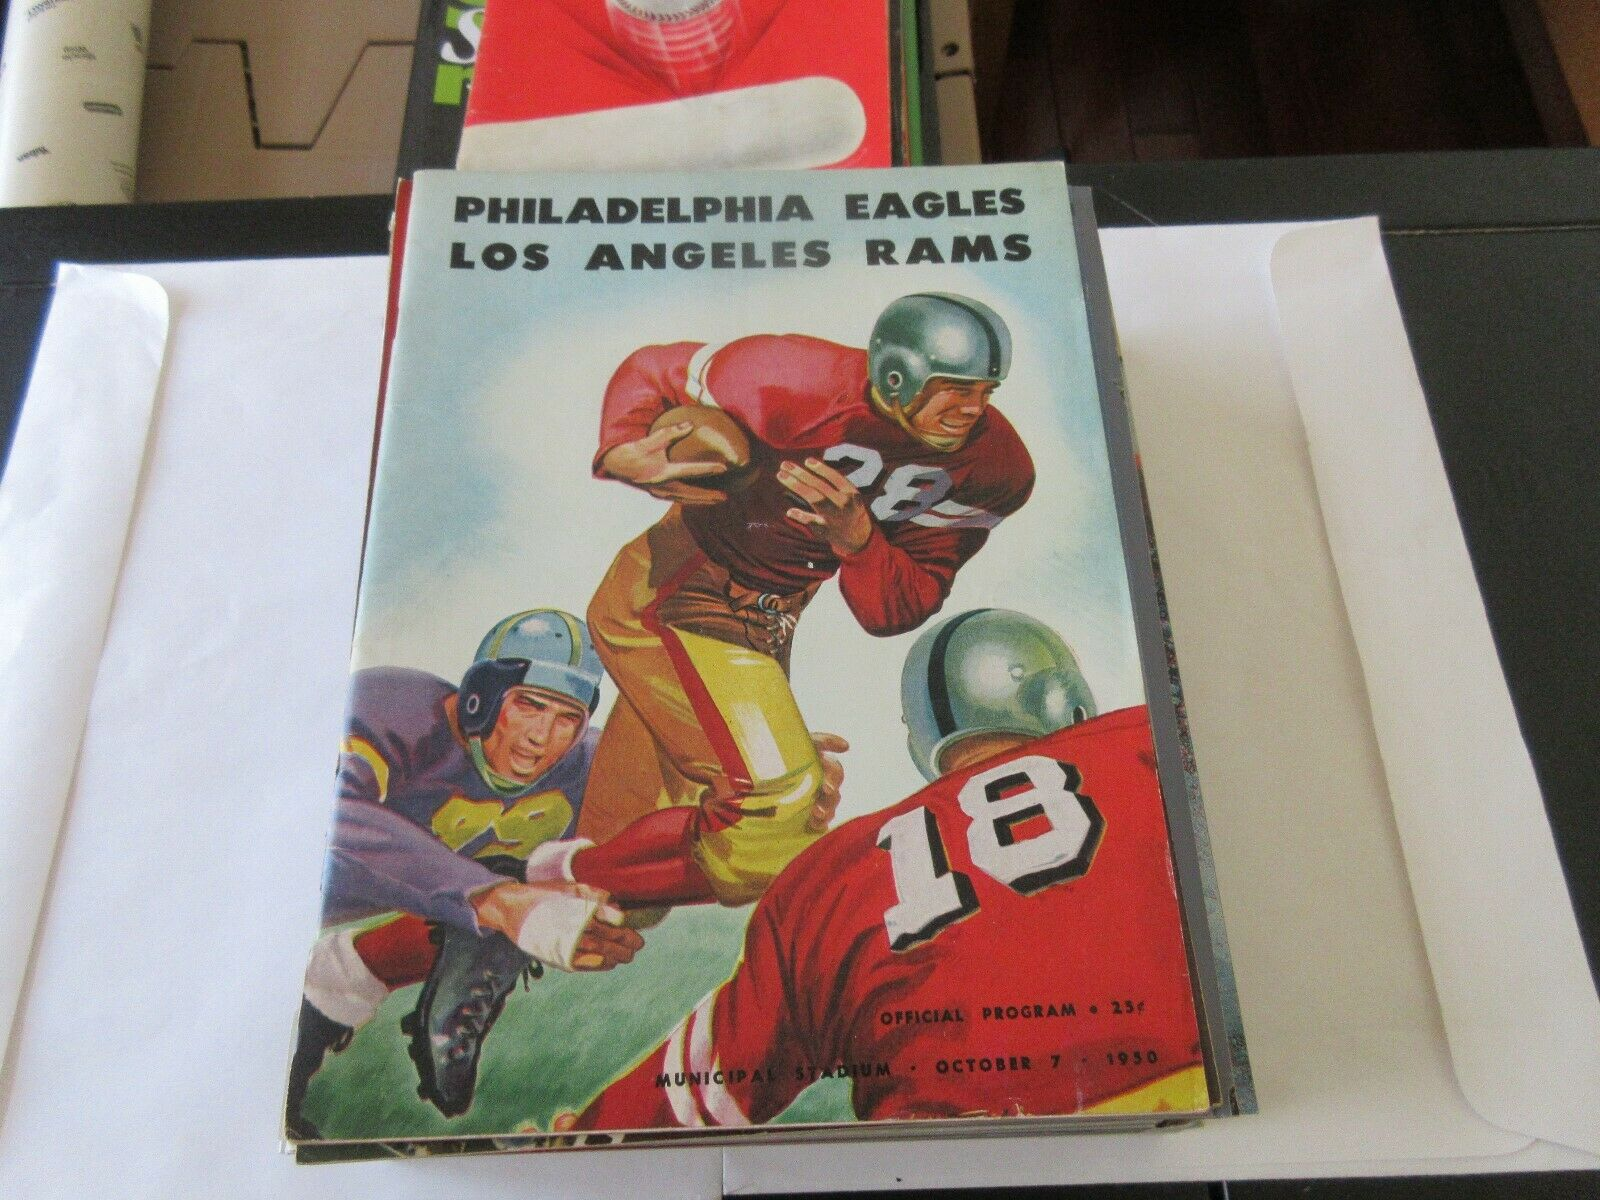 Philadelphia Eagles / Los Angeles Rams , Official Progr